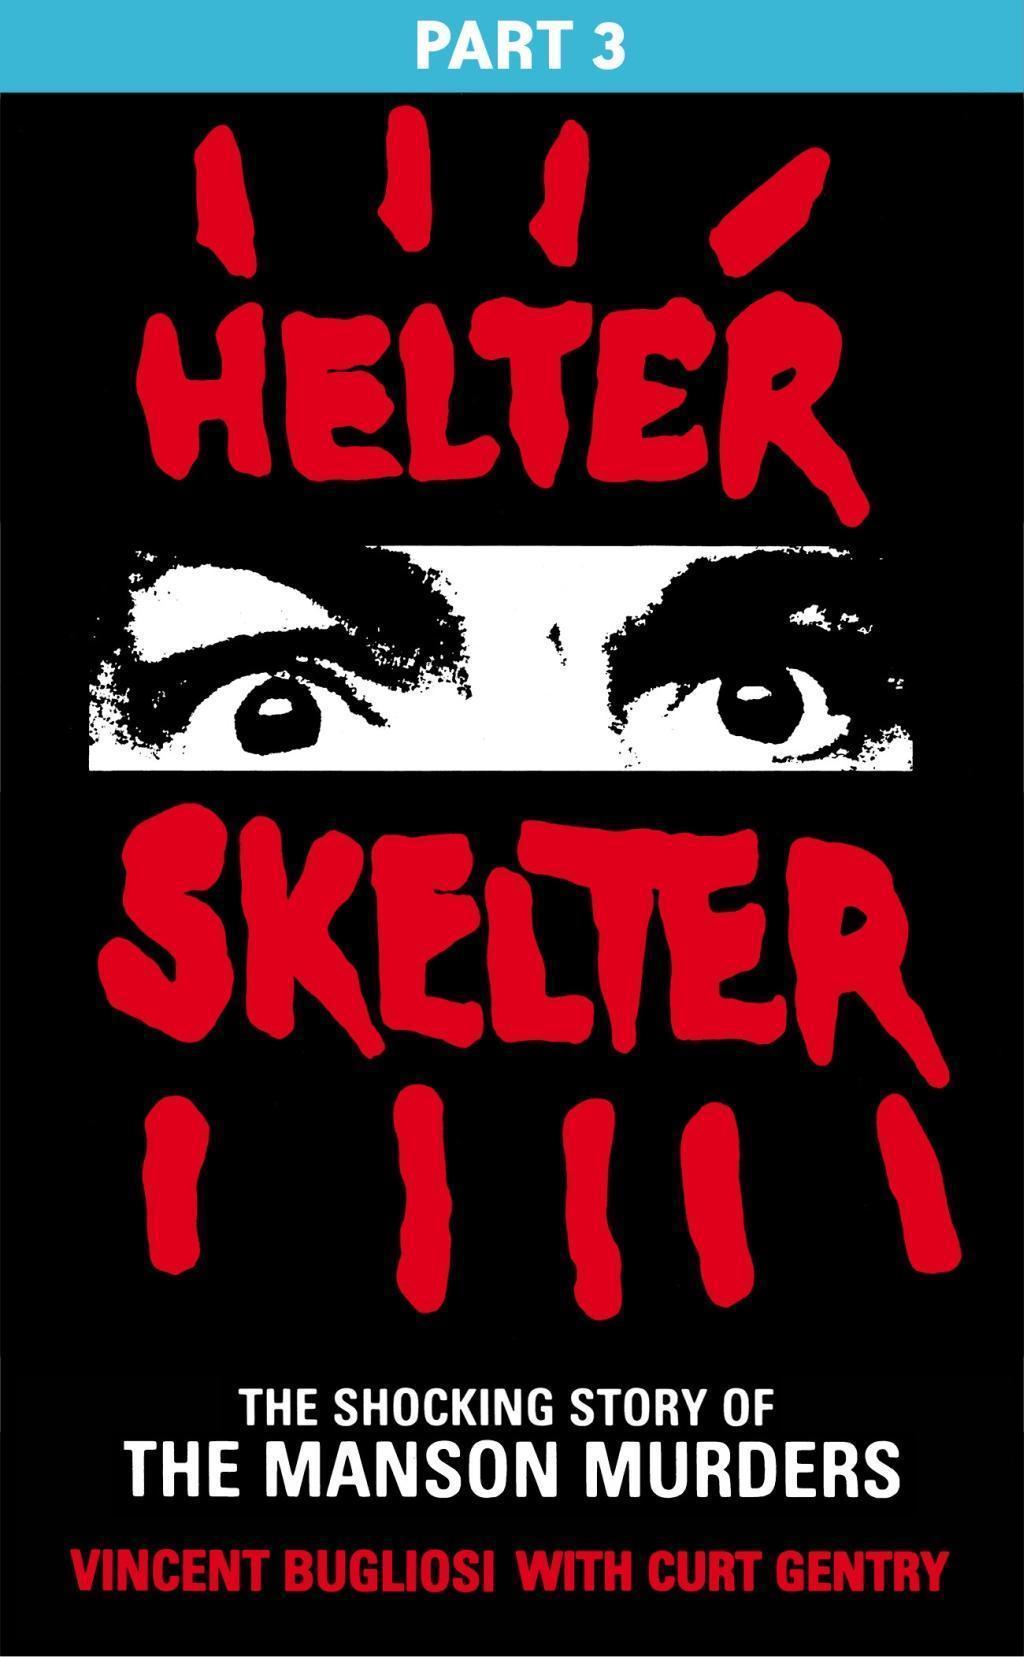 Helter Skelter: Part Three of the Shocking Manson Murders